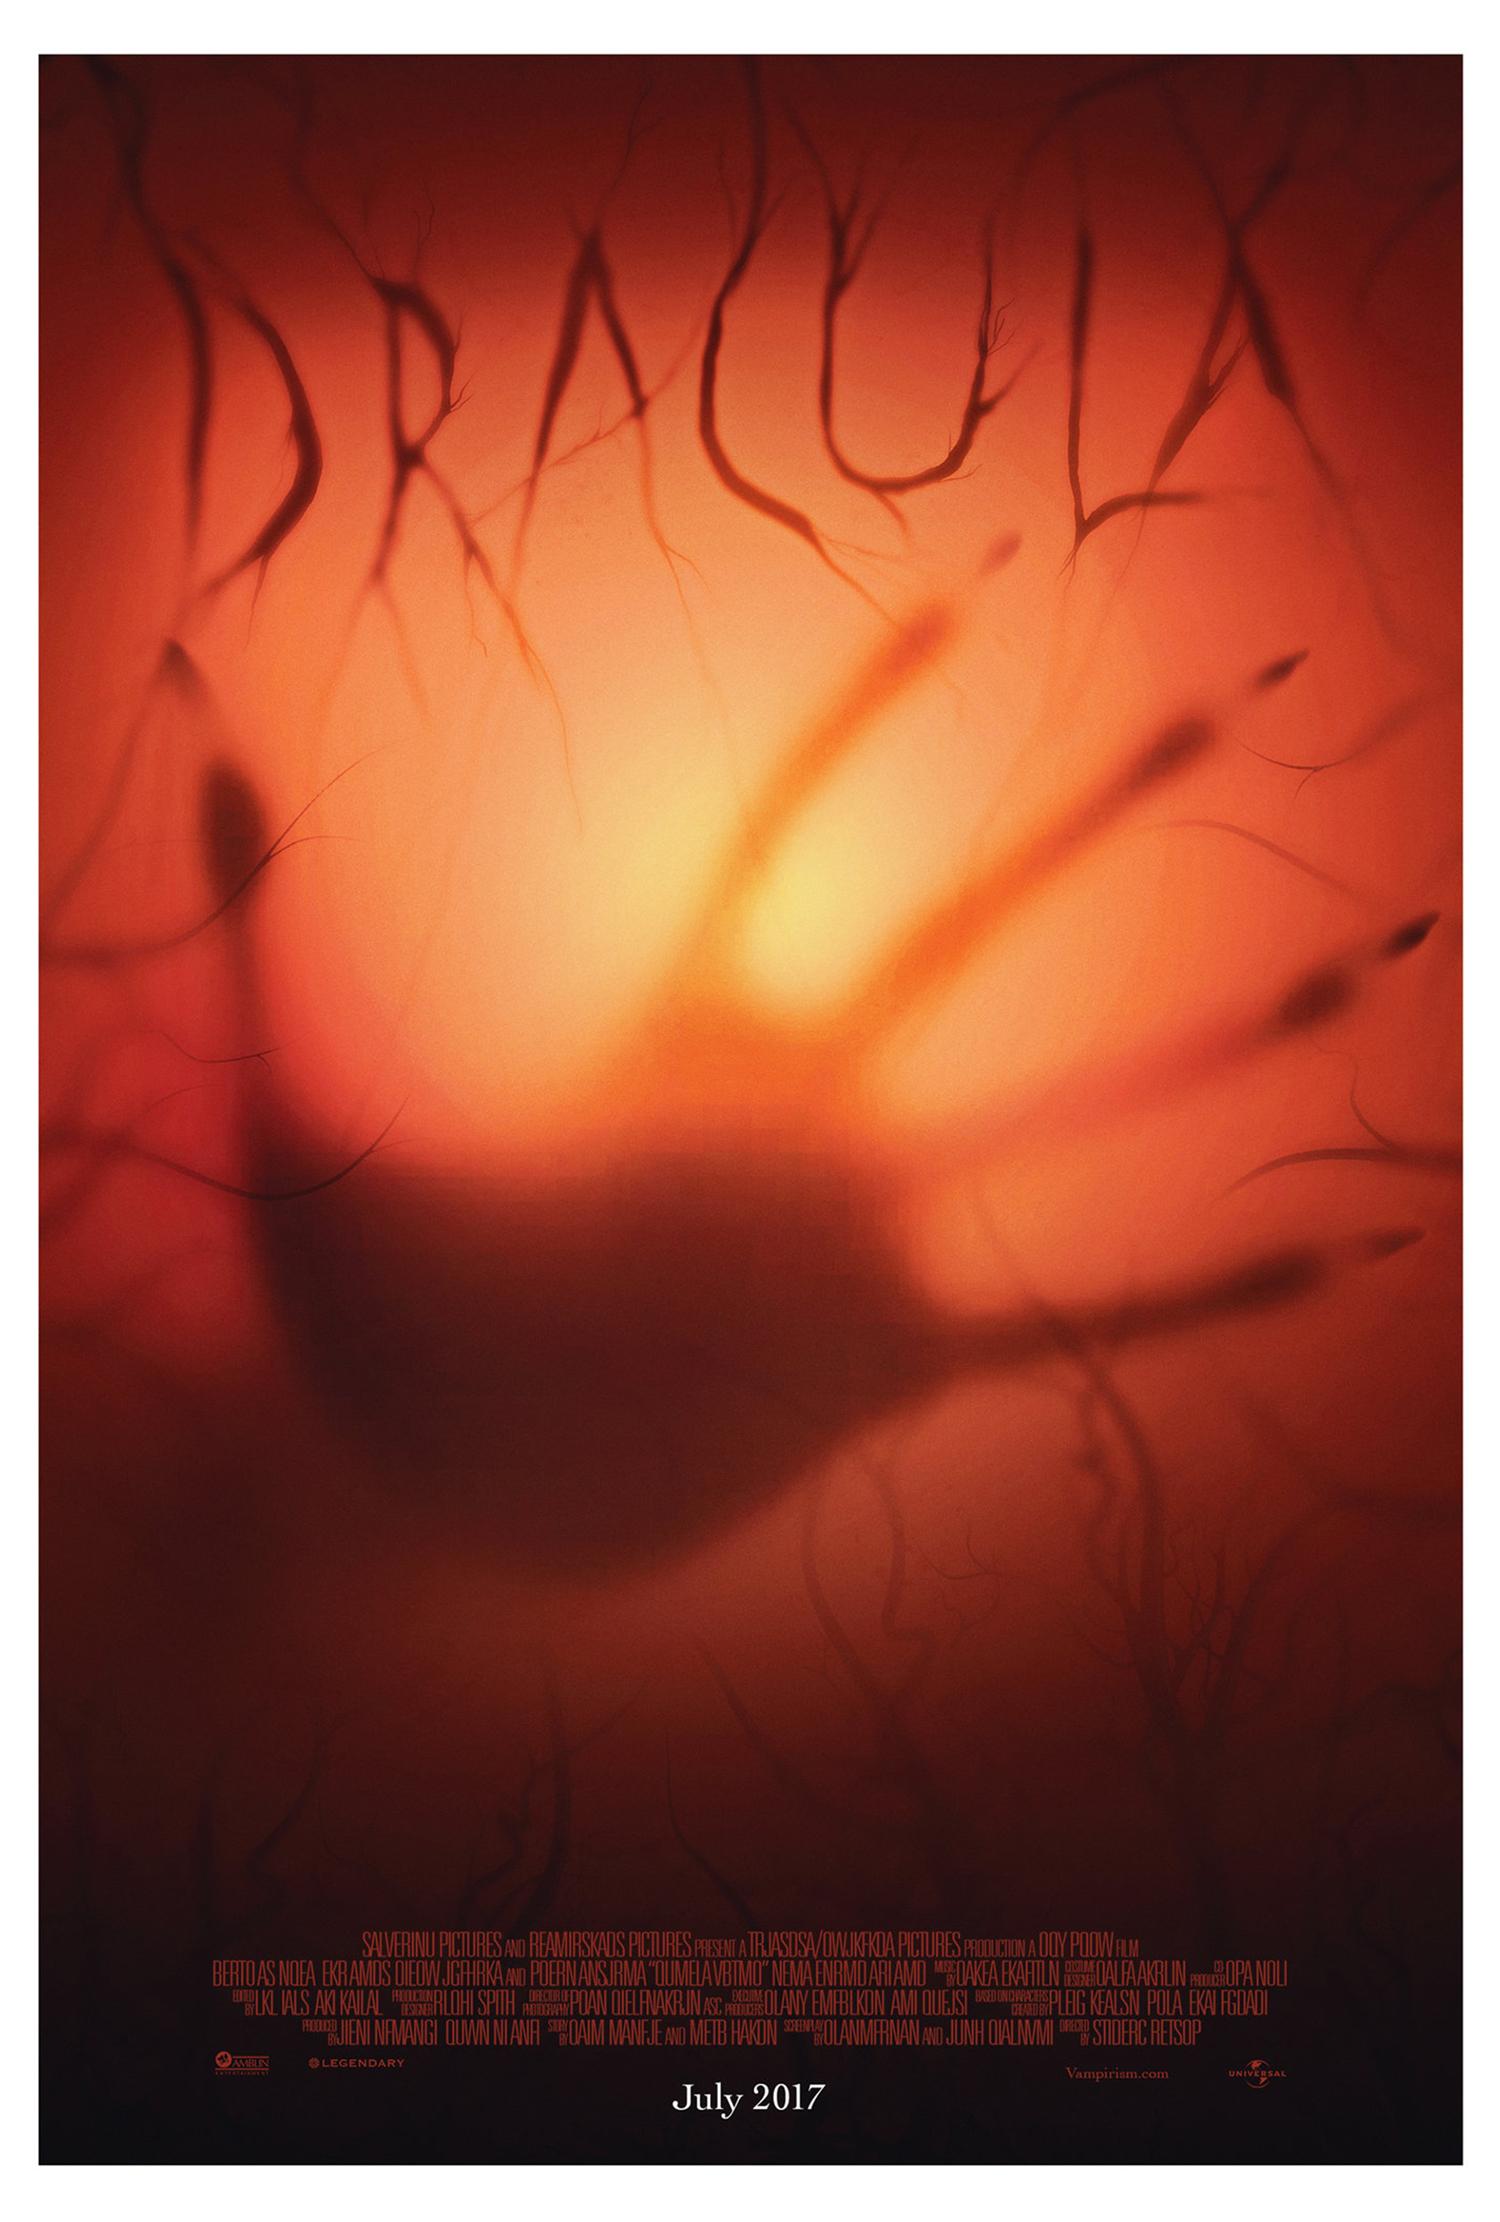 drac.jpg